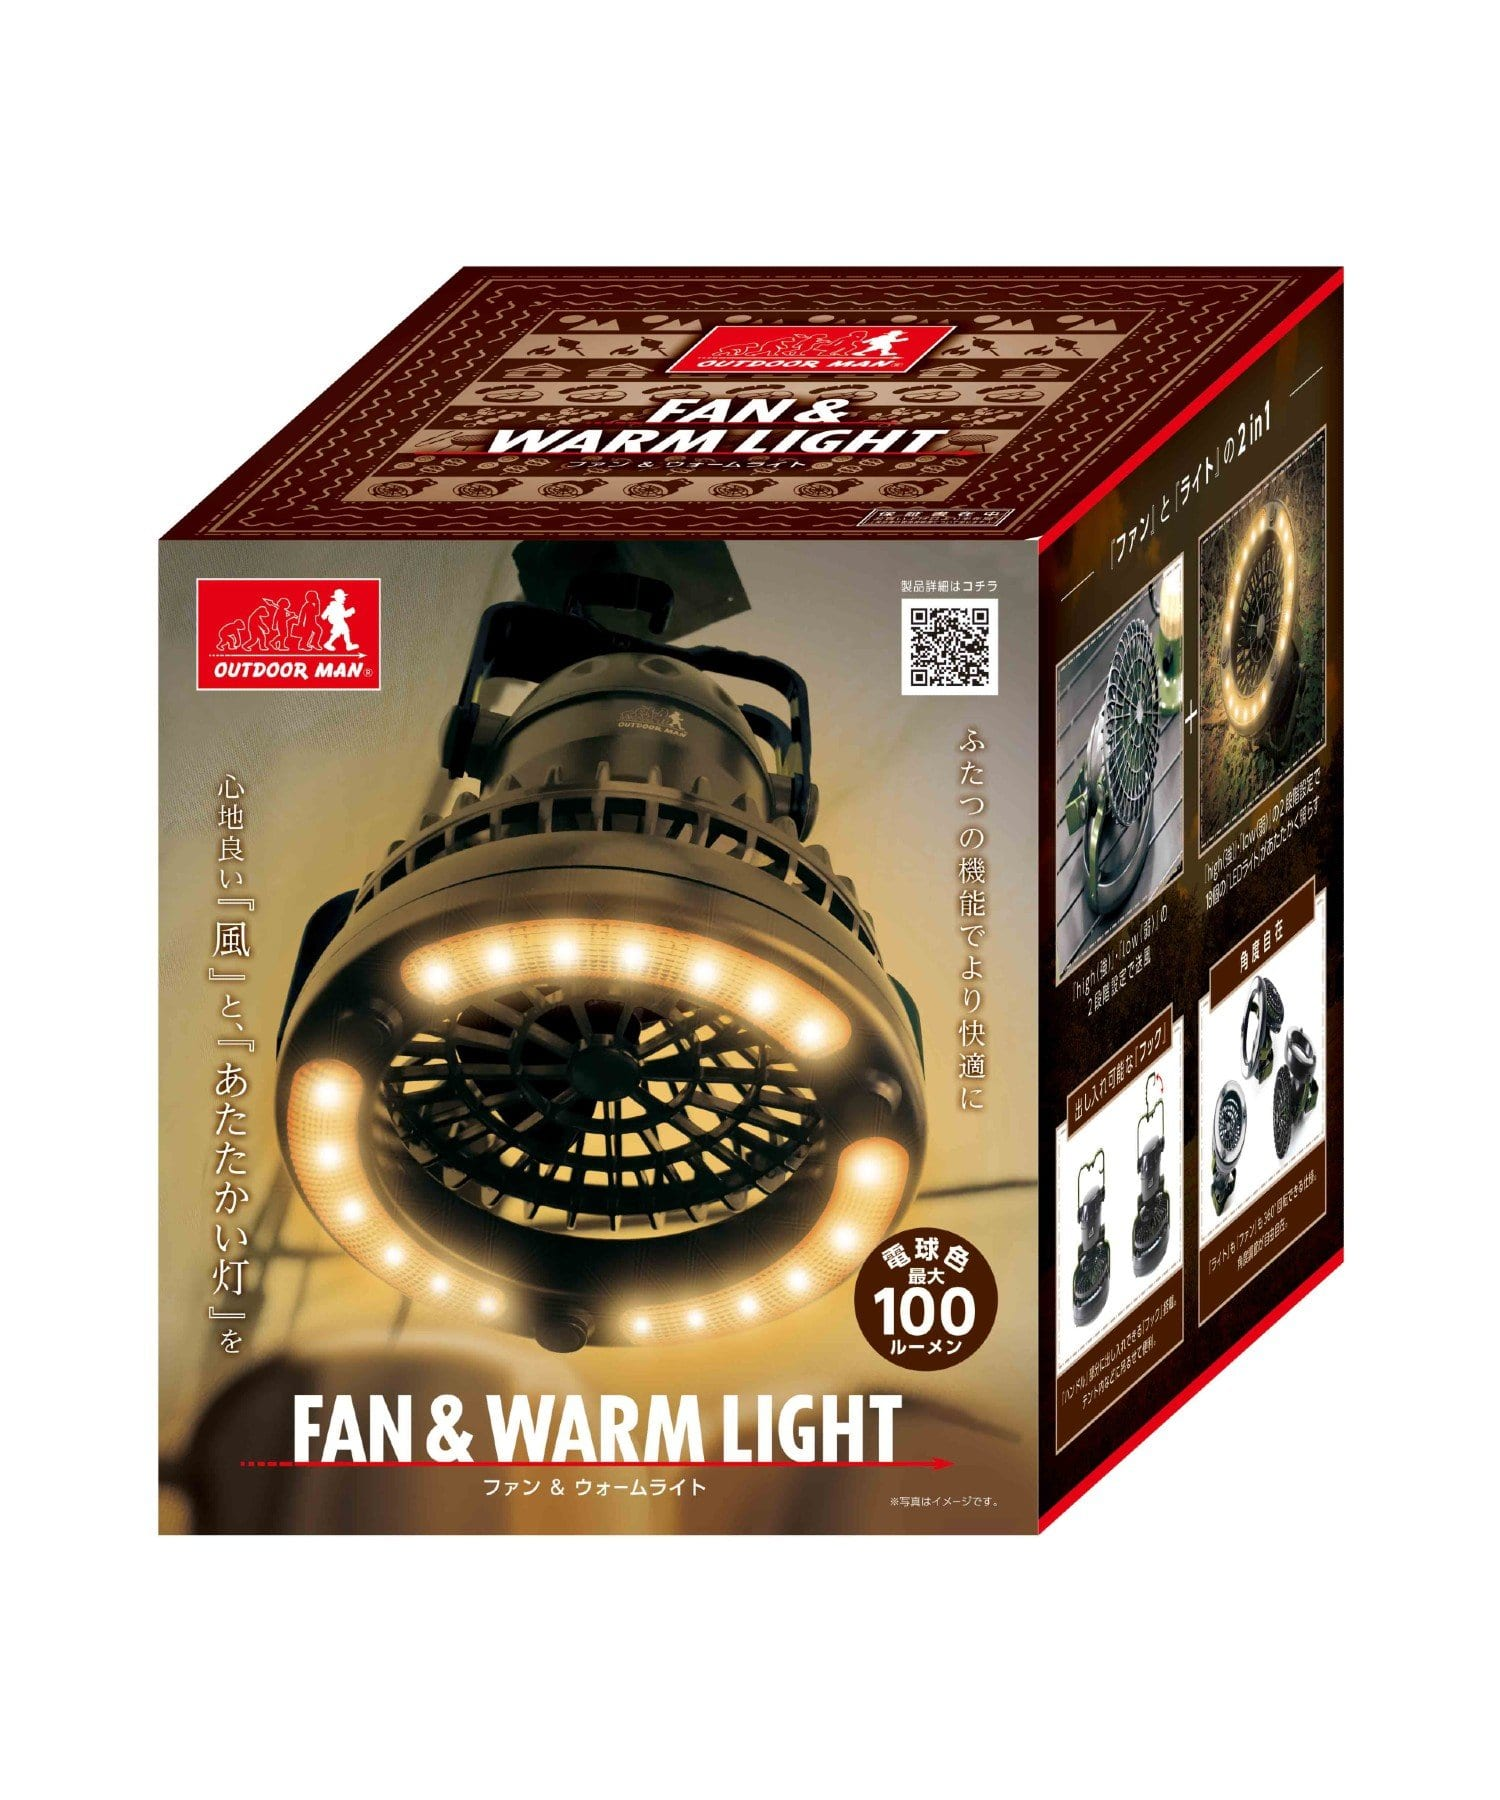 COLONY 2139(コロニー トゥーワンスリーナイン) FAN&WARM LIGHT